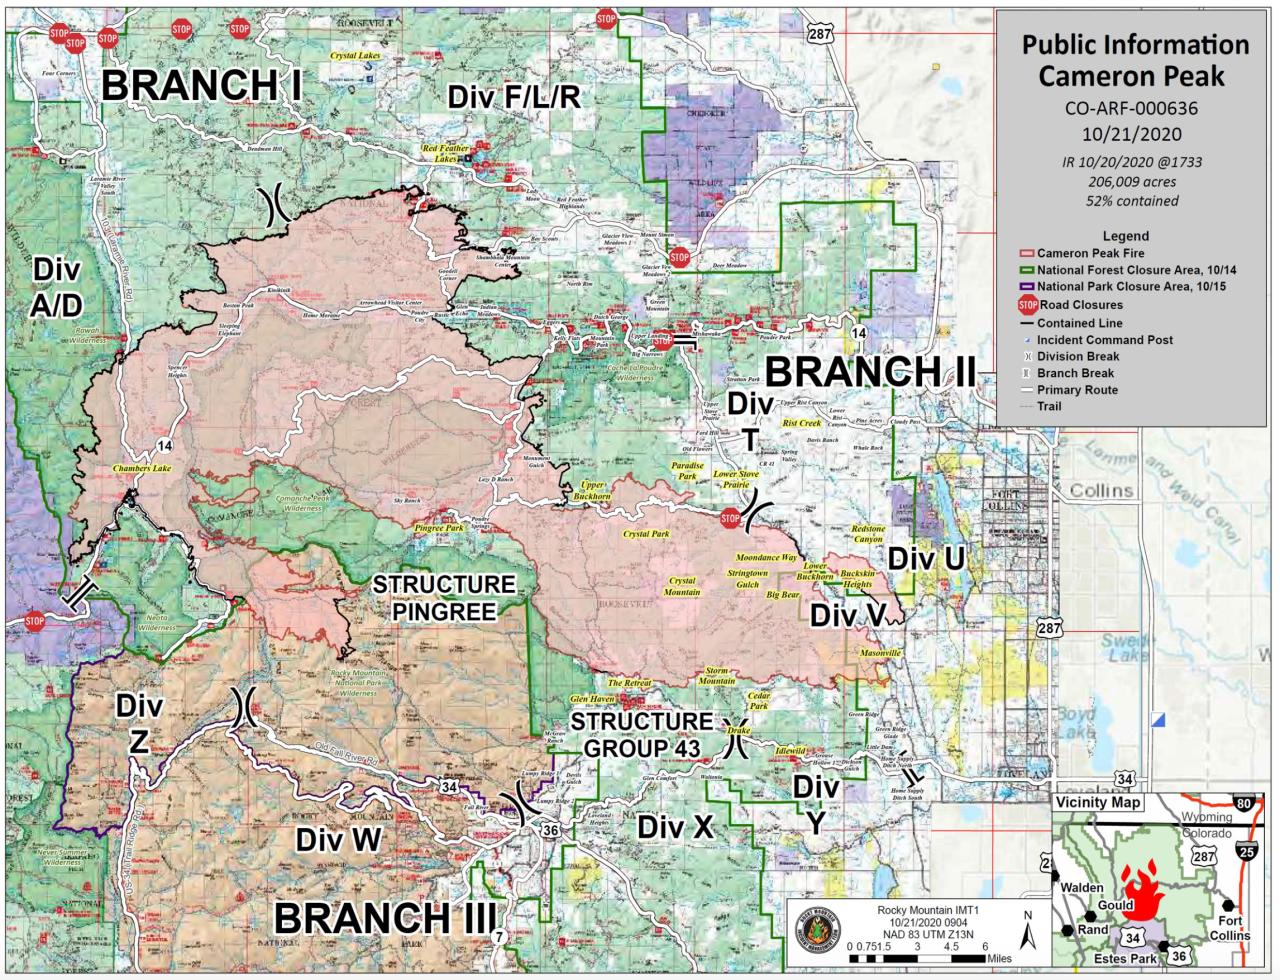 Cameron Peak Fire map_Oct 21 2020